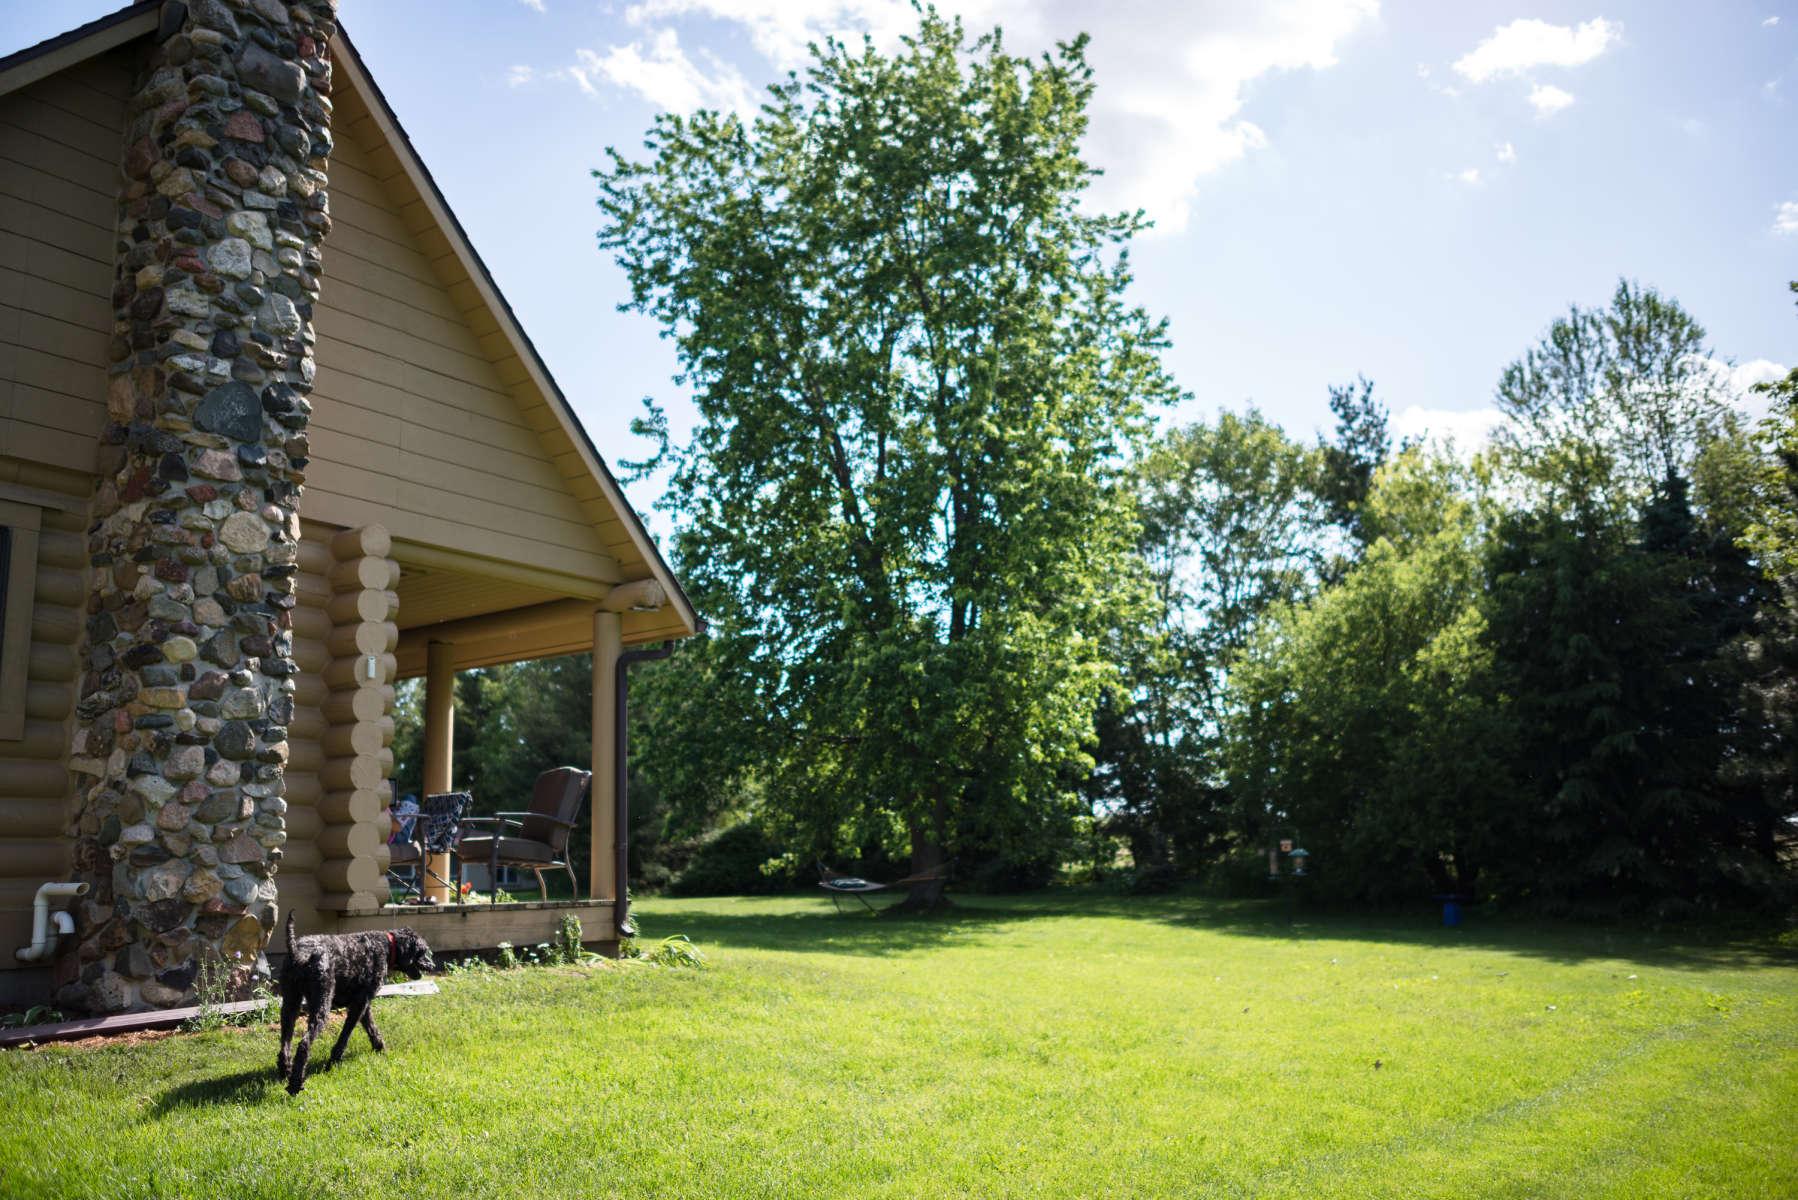 Log cabin retreat still point farm wi 2 hipcamper for Log cabin retreat